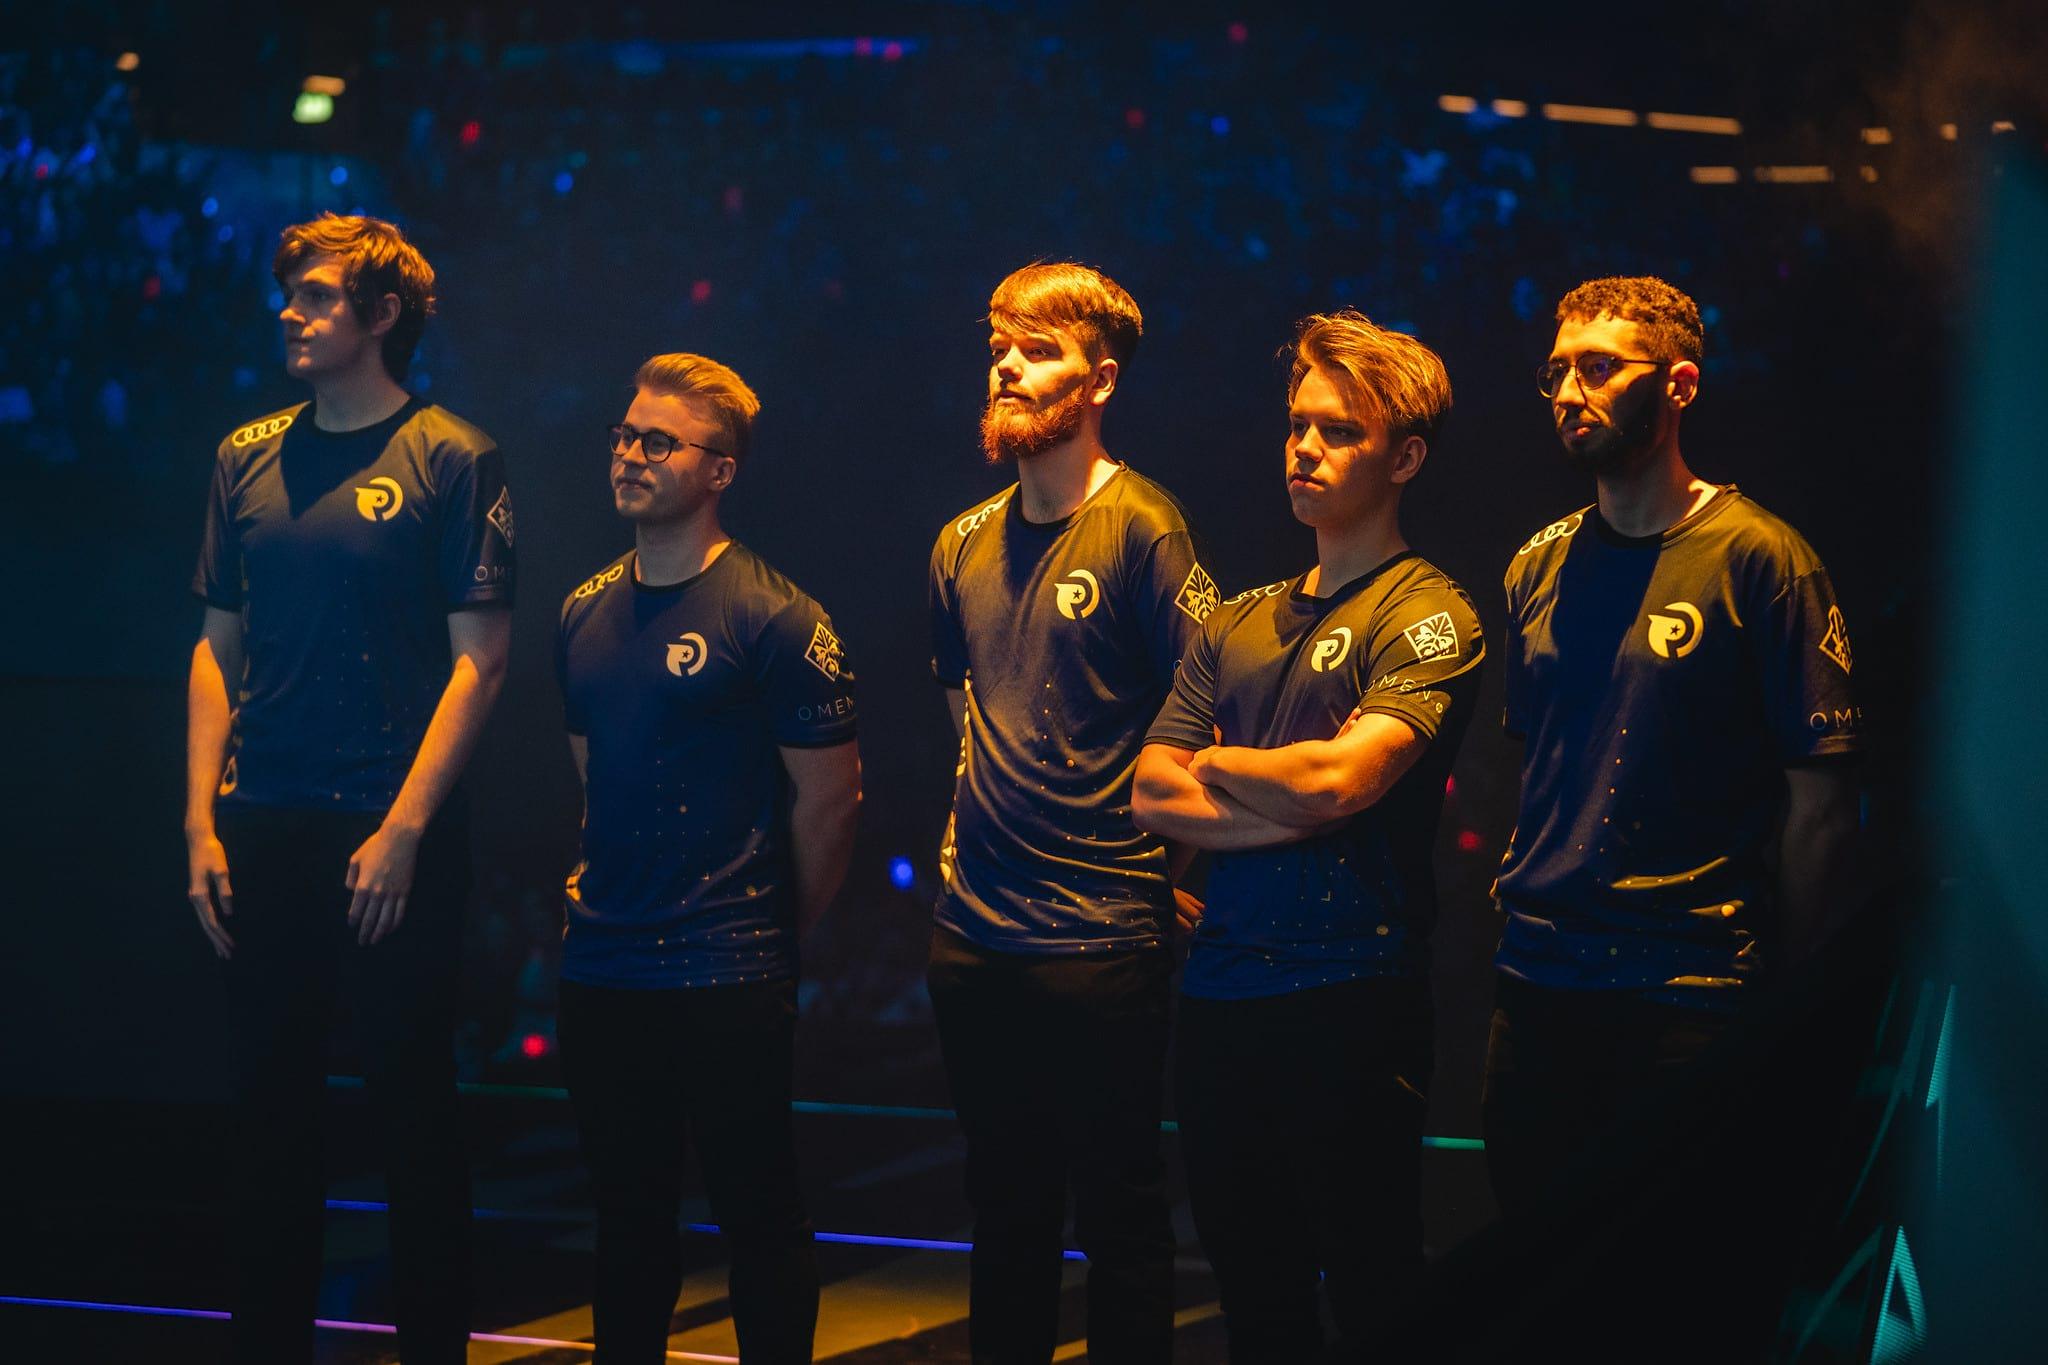 Origen's League of Legends squad at the LEC Spring Final 2019.